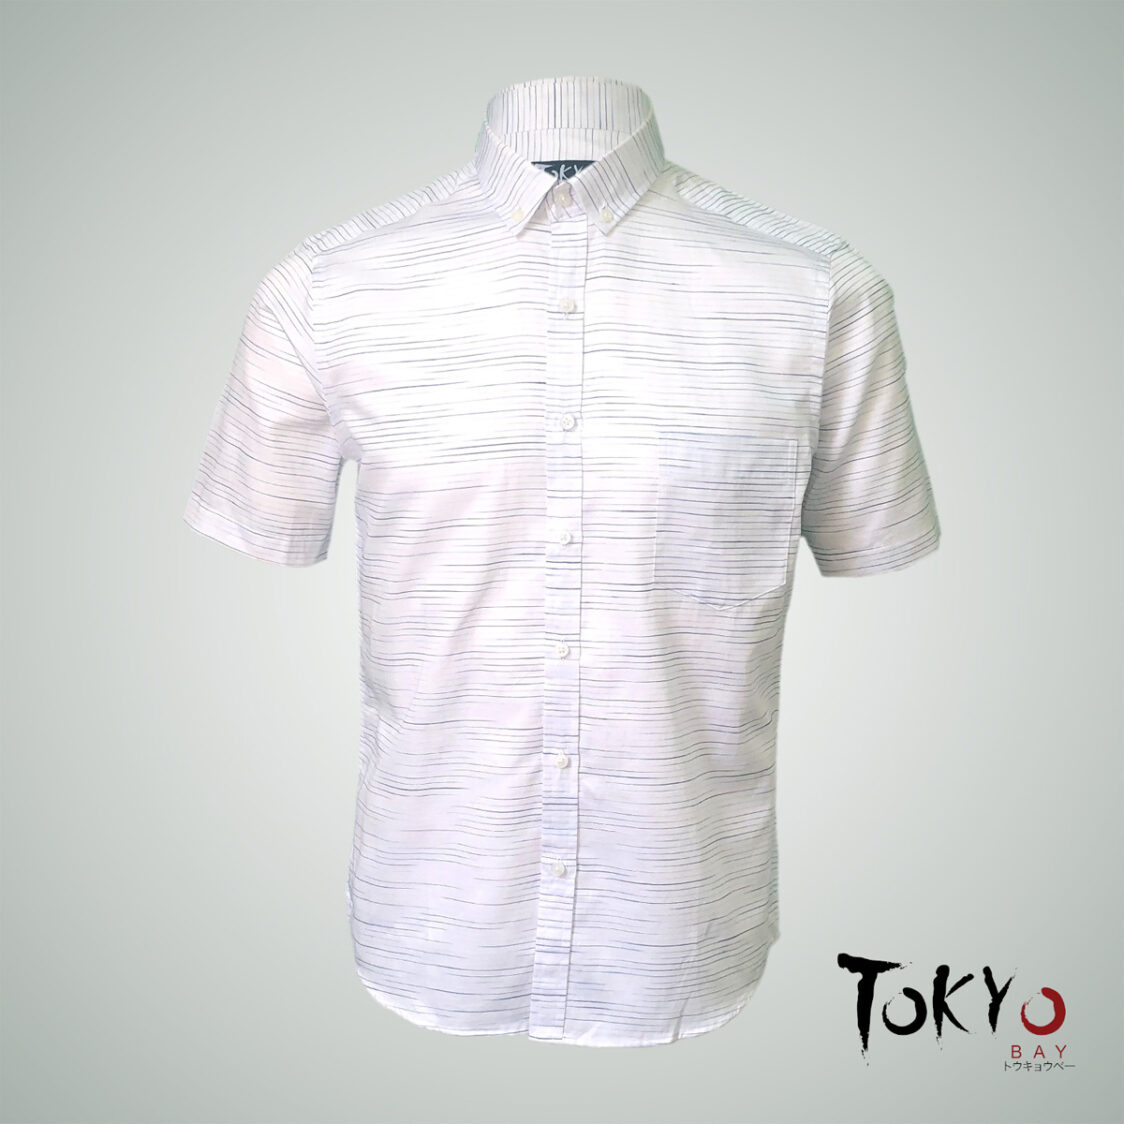 Tokyo Bay White Horizontal Striped Short Sleeve Shirt